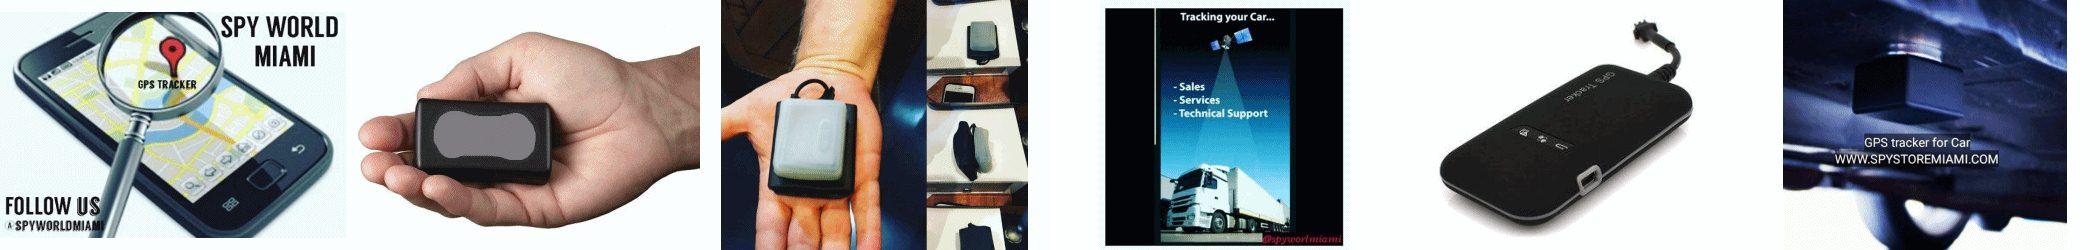 Auto GPS systems Miami Beach Coral Gables